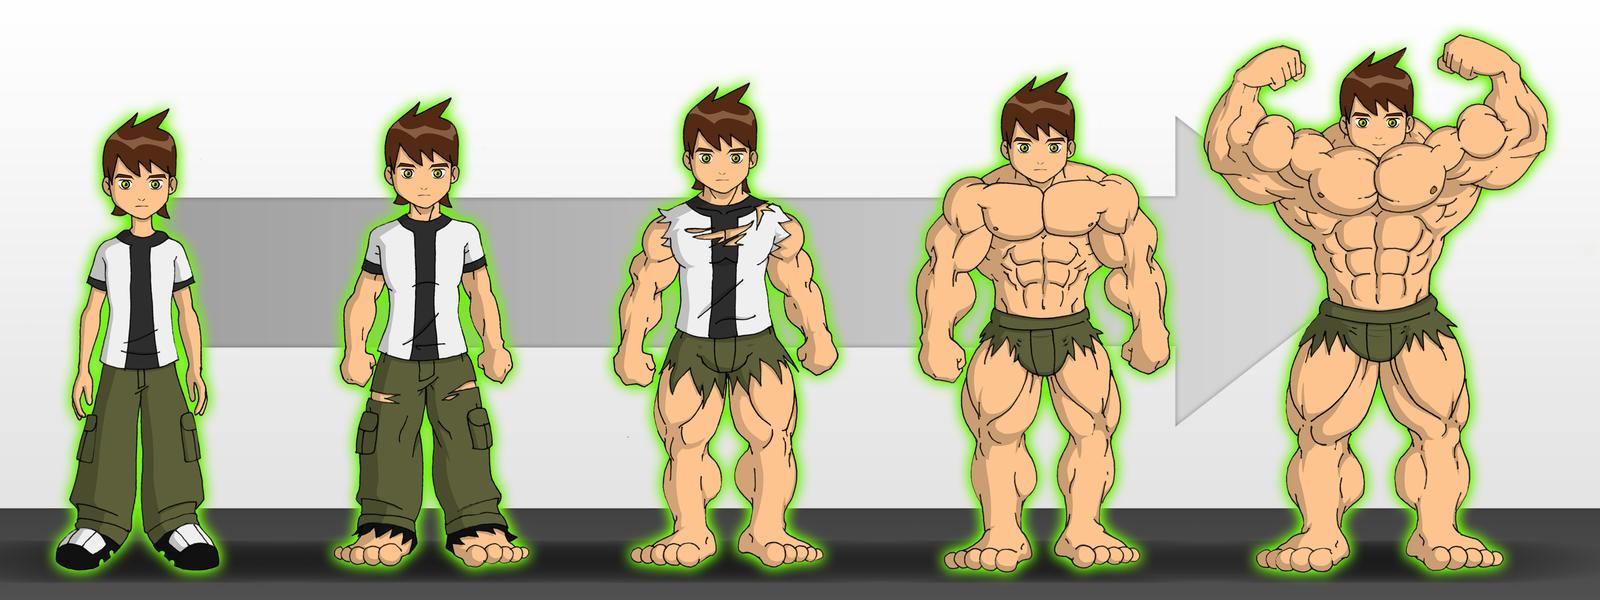 Bathroom Growth by hearmenowu2 on DeviantArt  Ben Muscle Growth